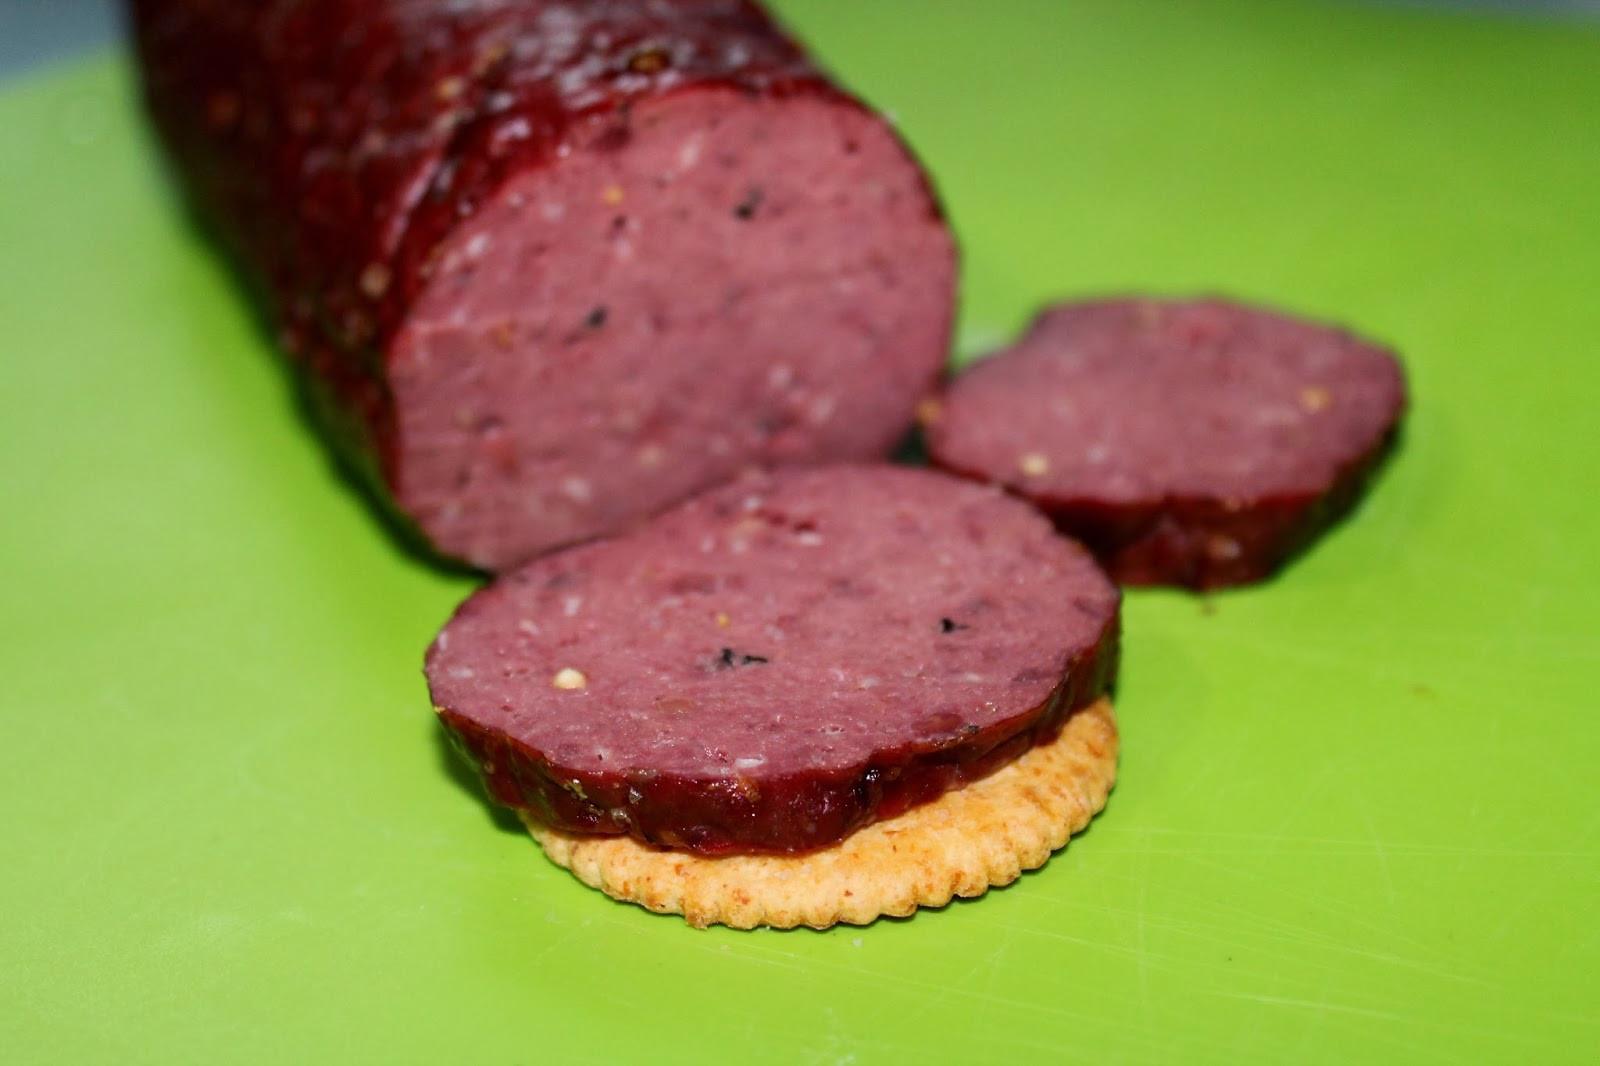 Smoked Beef Summer Sausage Recipe  Man That Stuff Is Good Homemade Venison Summer Sausage